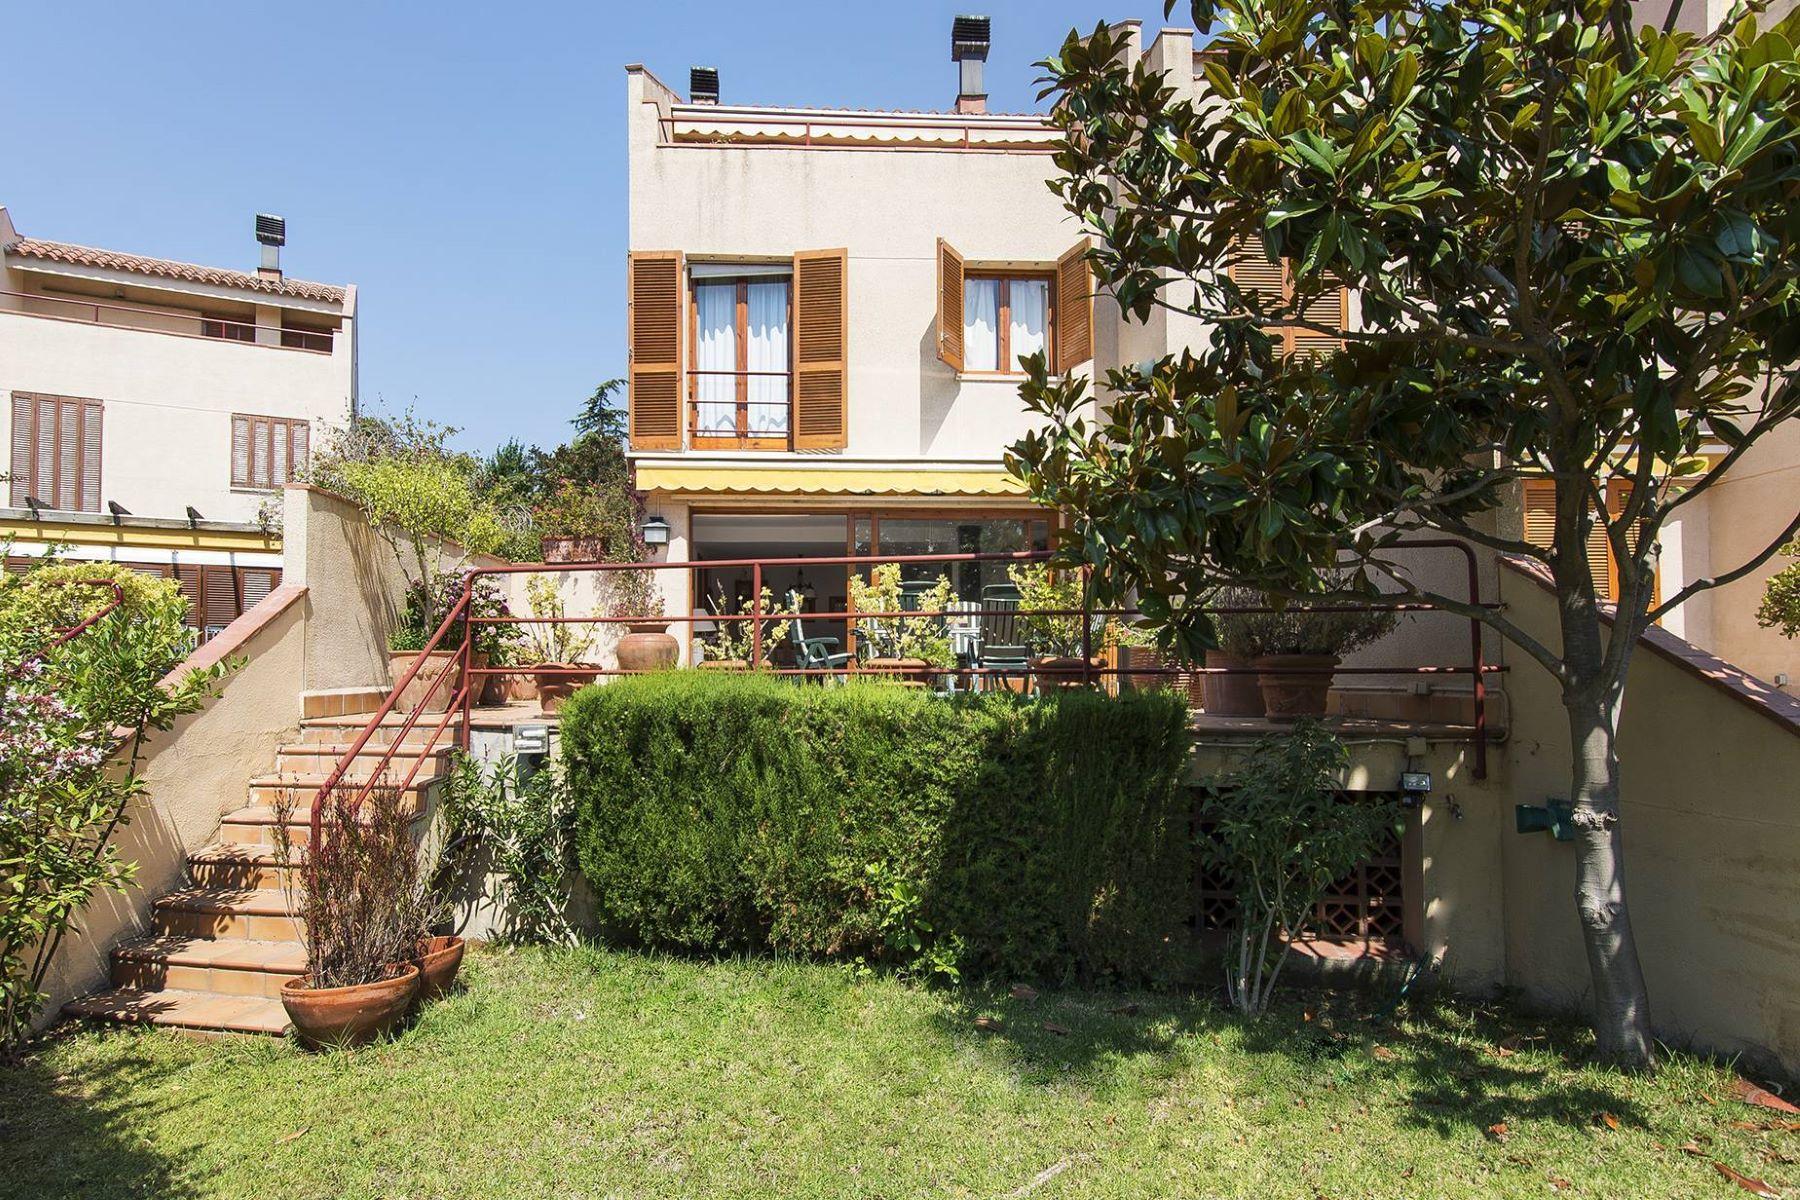 Tek Ailelik Ev için Satış at Fantastic terraced house 50 metres from the beach at S'Agaró S'Agaro, Costa Brava, 17248 Ispanya